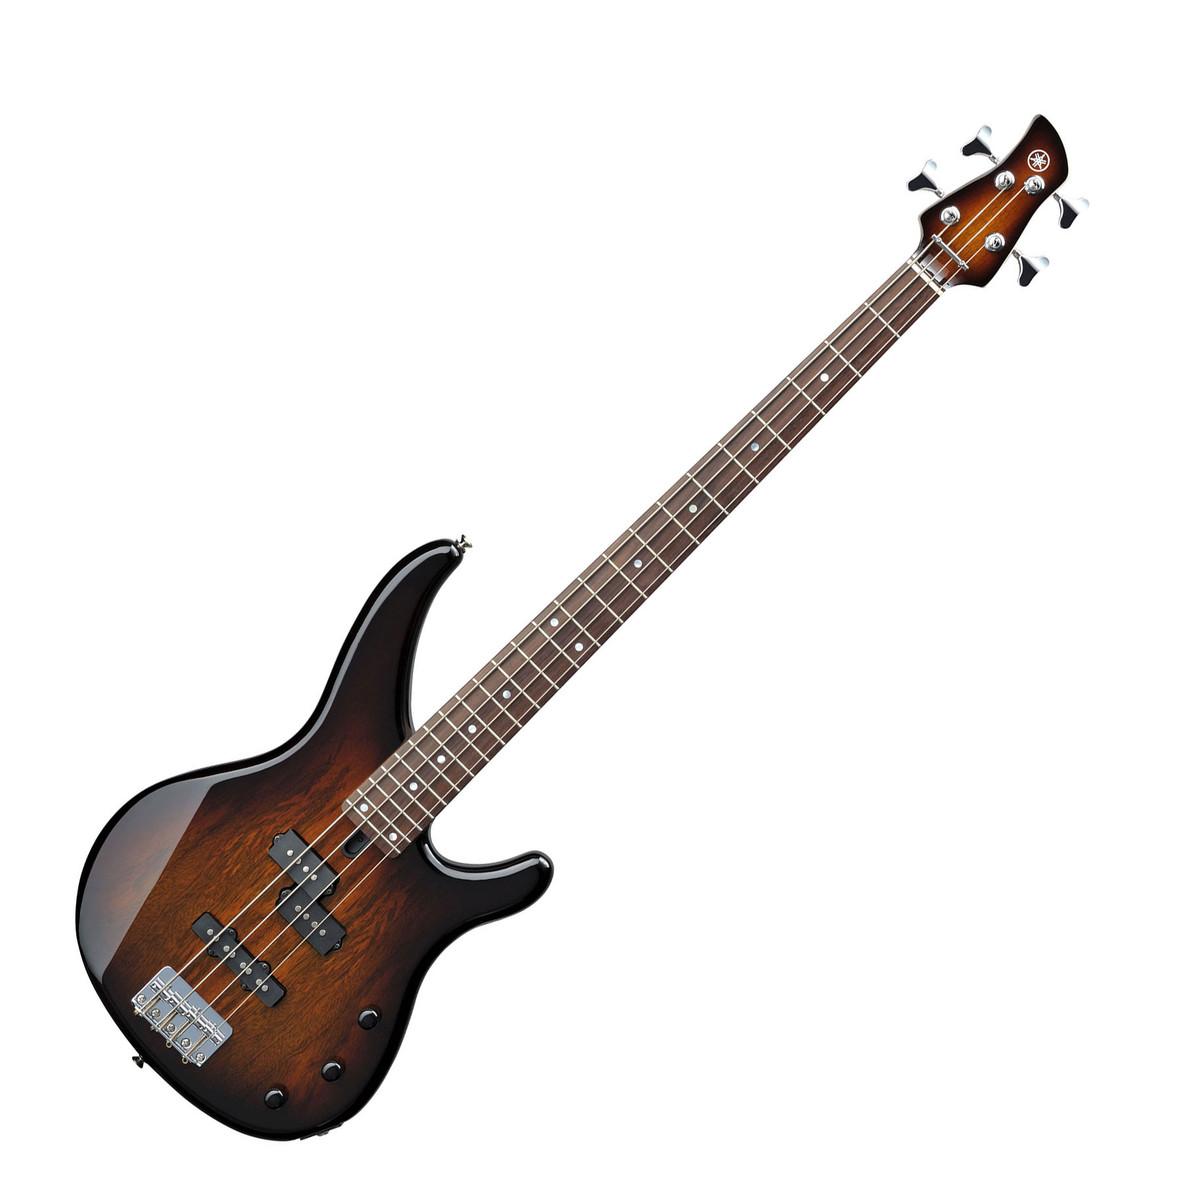 yamaha trbx174ew electric bass guitar tobacco brown sunburst at gear4music. Black Bedroom Furniture Sets. Home Design Ideas